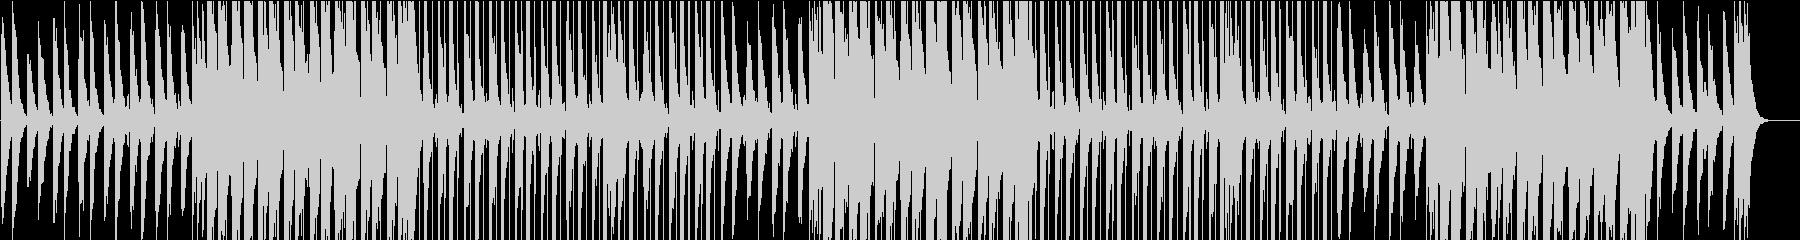 Lo-Fi、エモくお洒落なチルアウトの未再生の波形